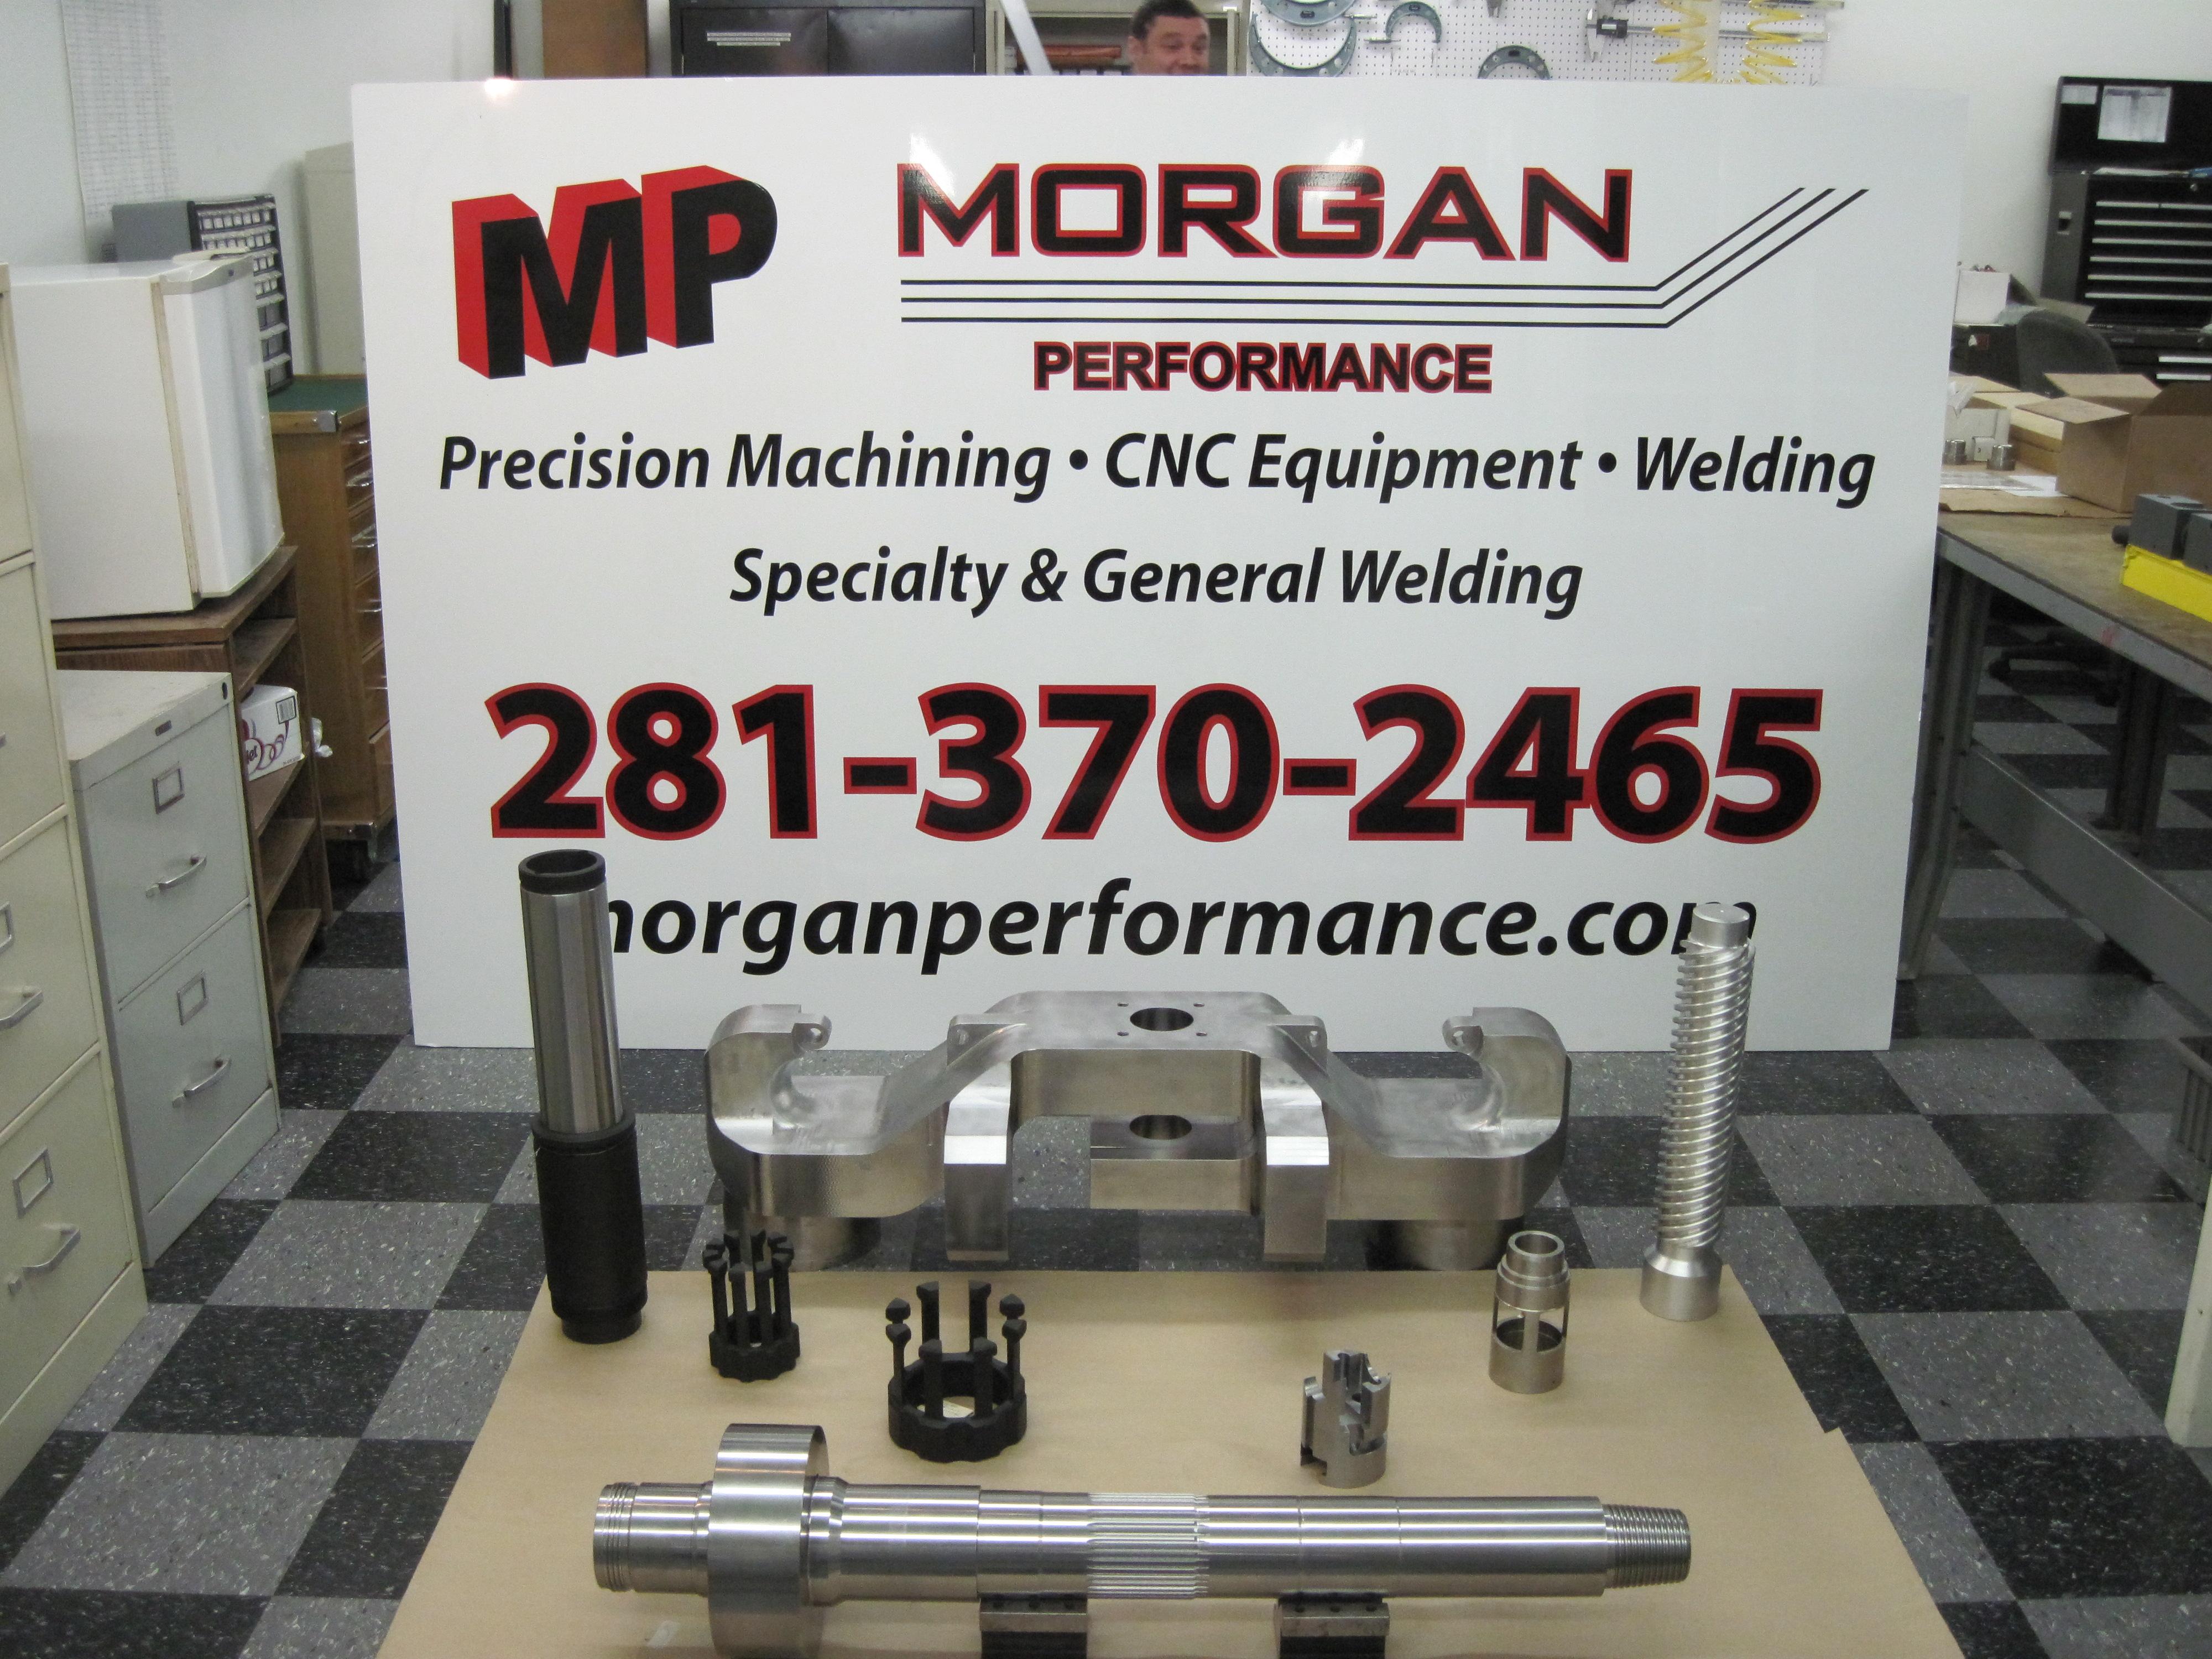 machine-shop-morgan-performance